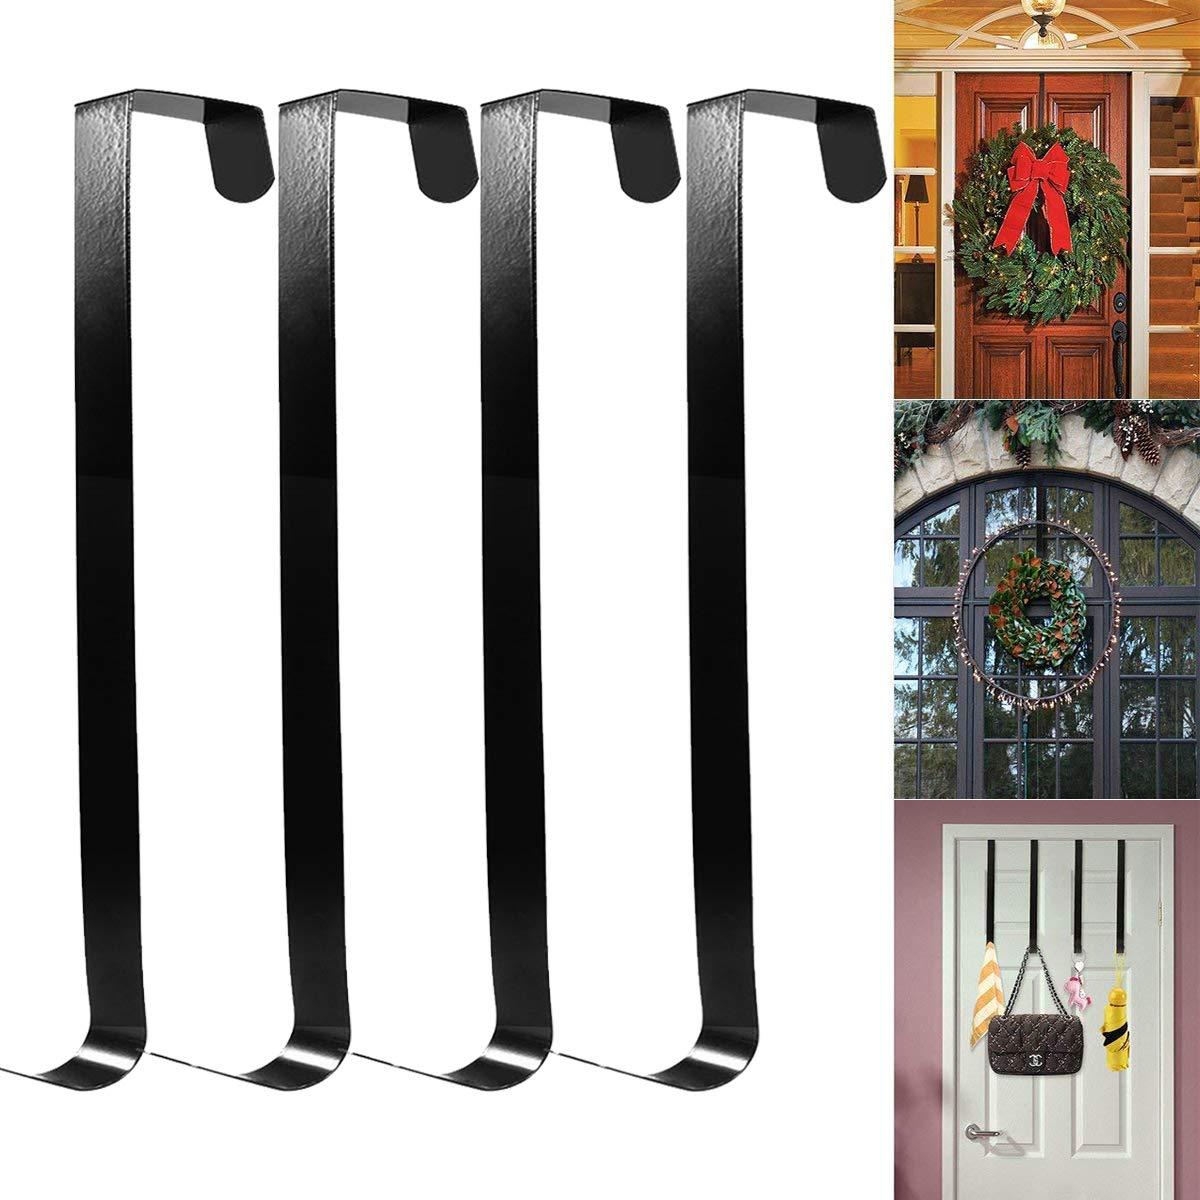 HOMEMAXS Metal Wreath Hanger Over The Door Wreath Holder 4 Packs 13.8inch Larger Wreath Metal Hook for Christmas (Black) by HOMEMAXS (Image #1)